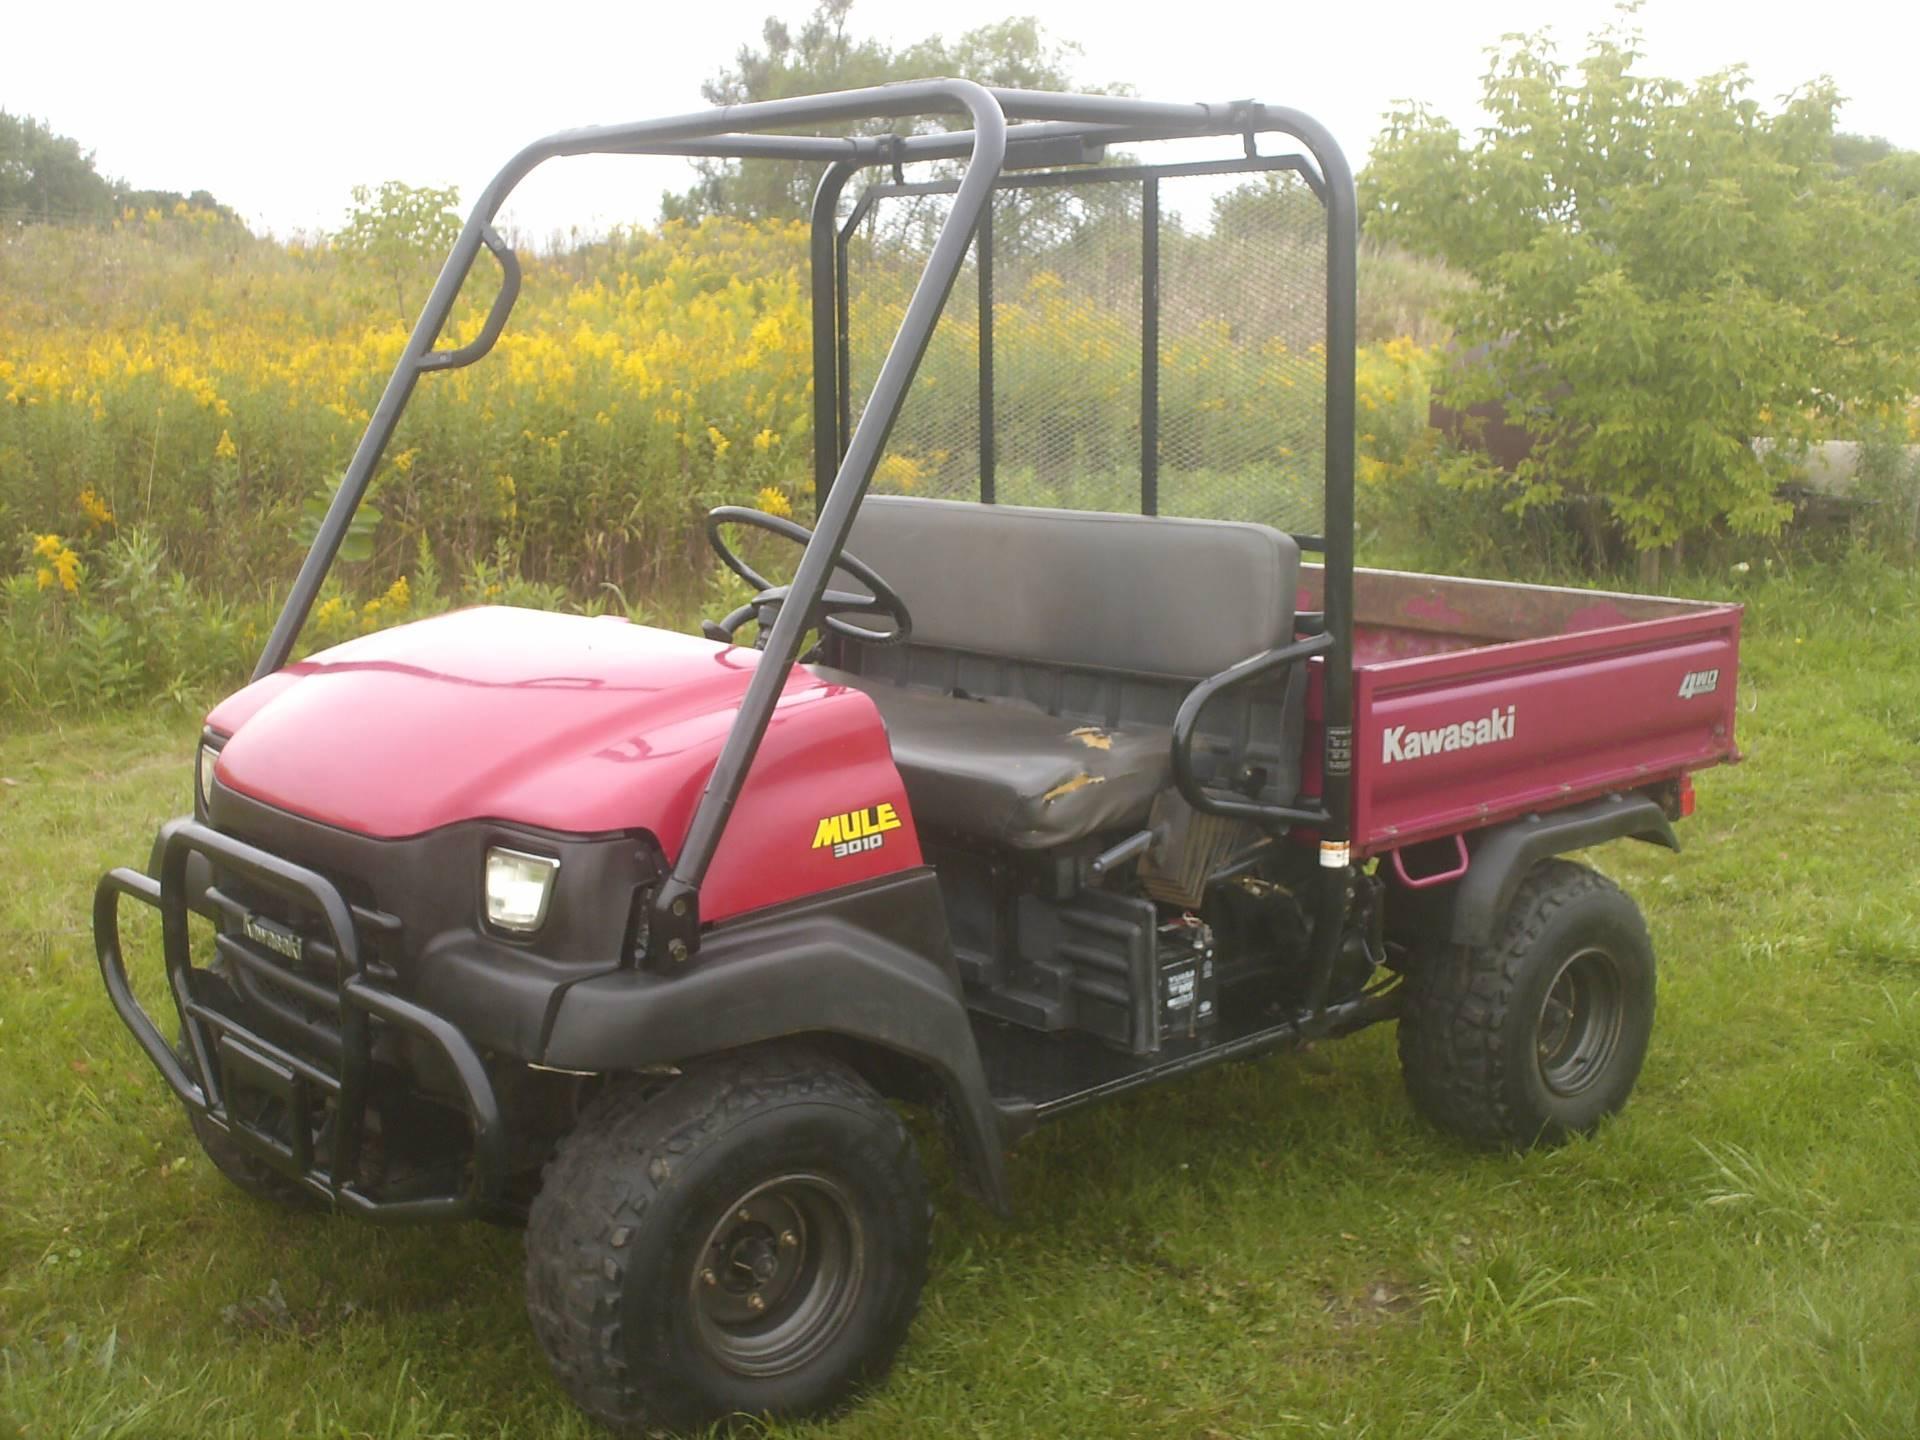 Used 2006 Kawasaki Mule 3010 4x4 Utility Vehicles In Mukwonago Wi Fuel Filter Wisconsin